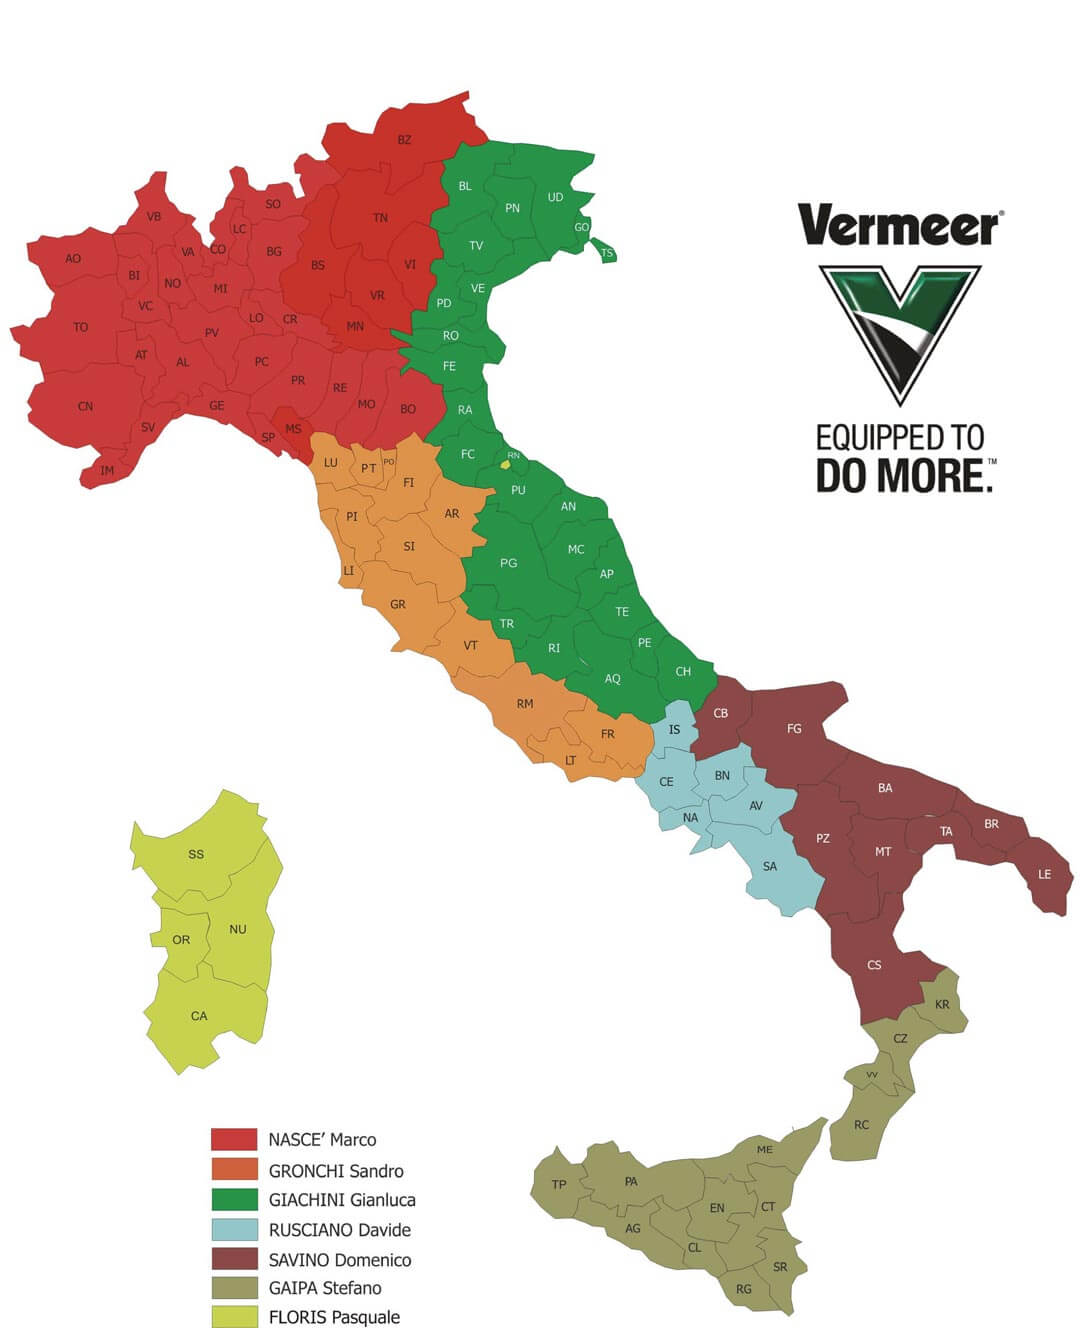 aree competenza commerciali vermeer italia